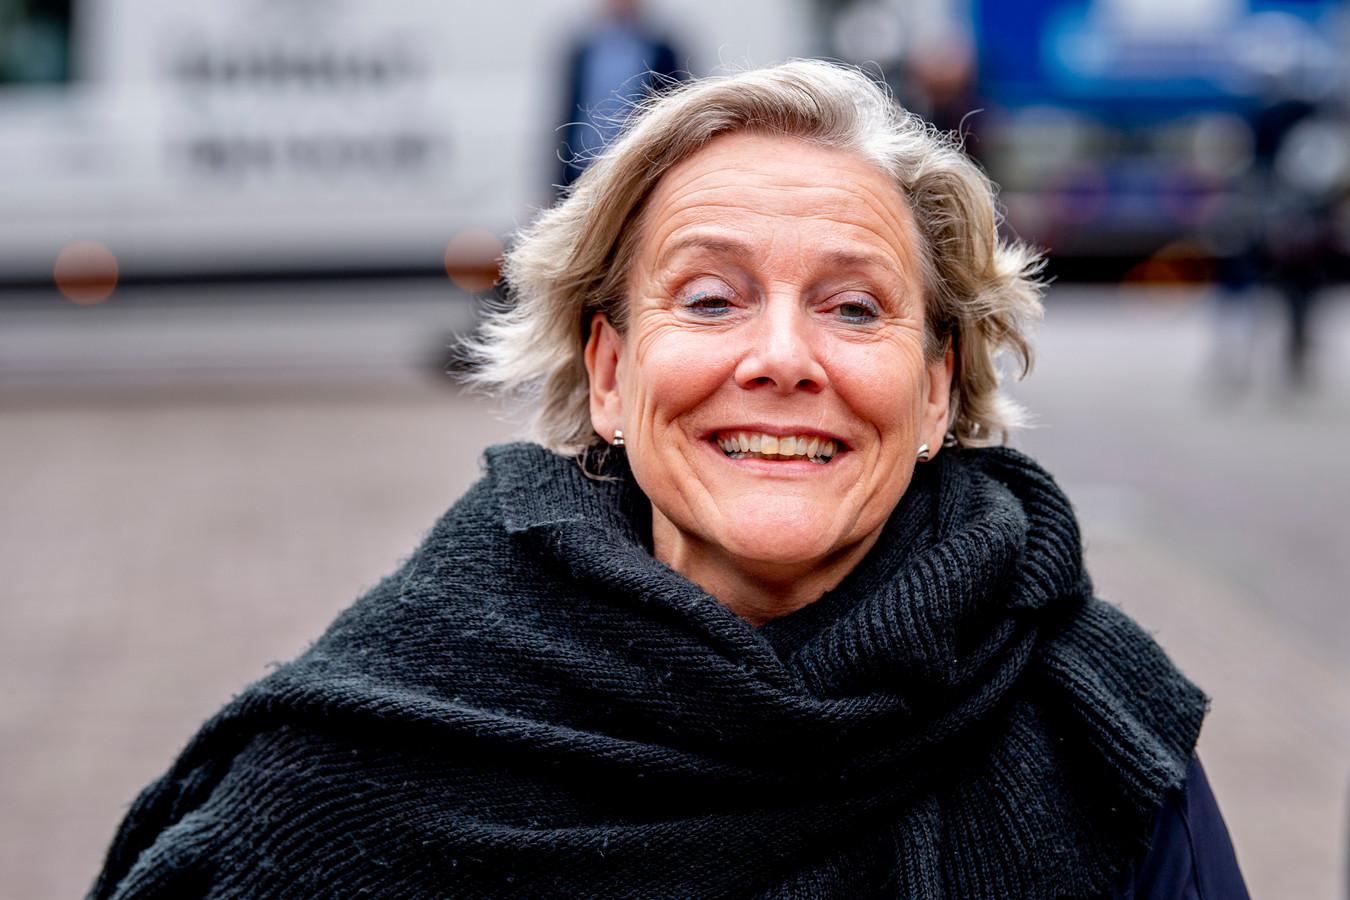 Demissionair minister Ank Bijleveld